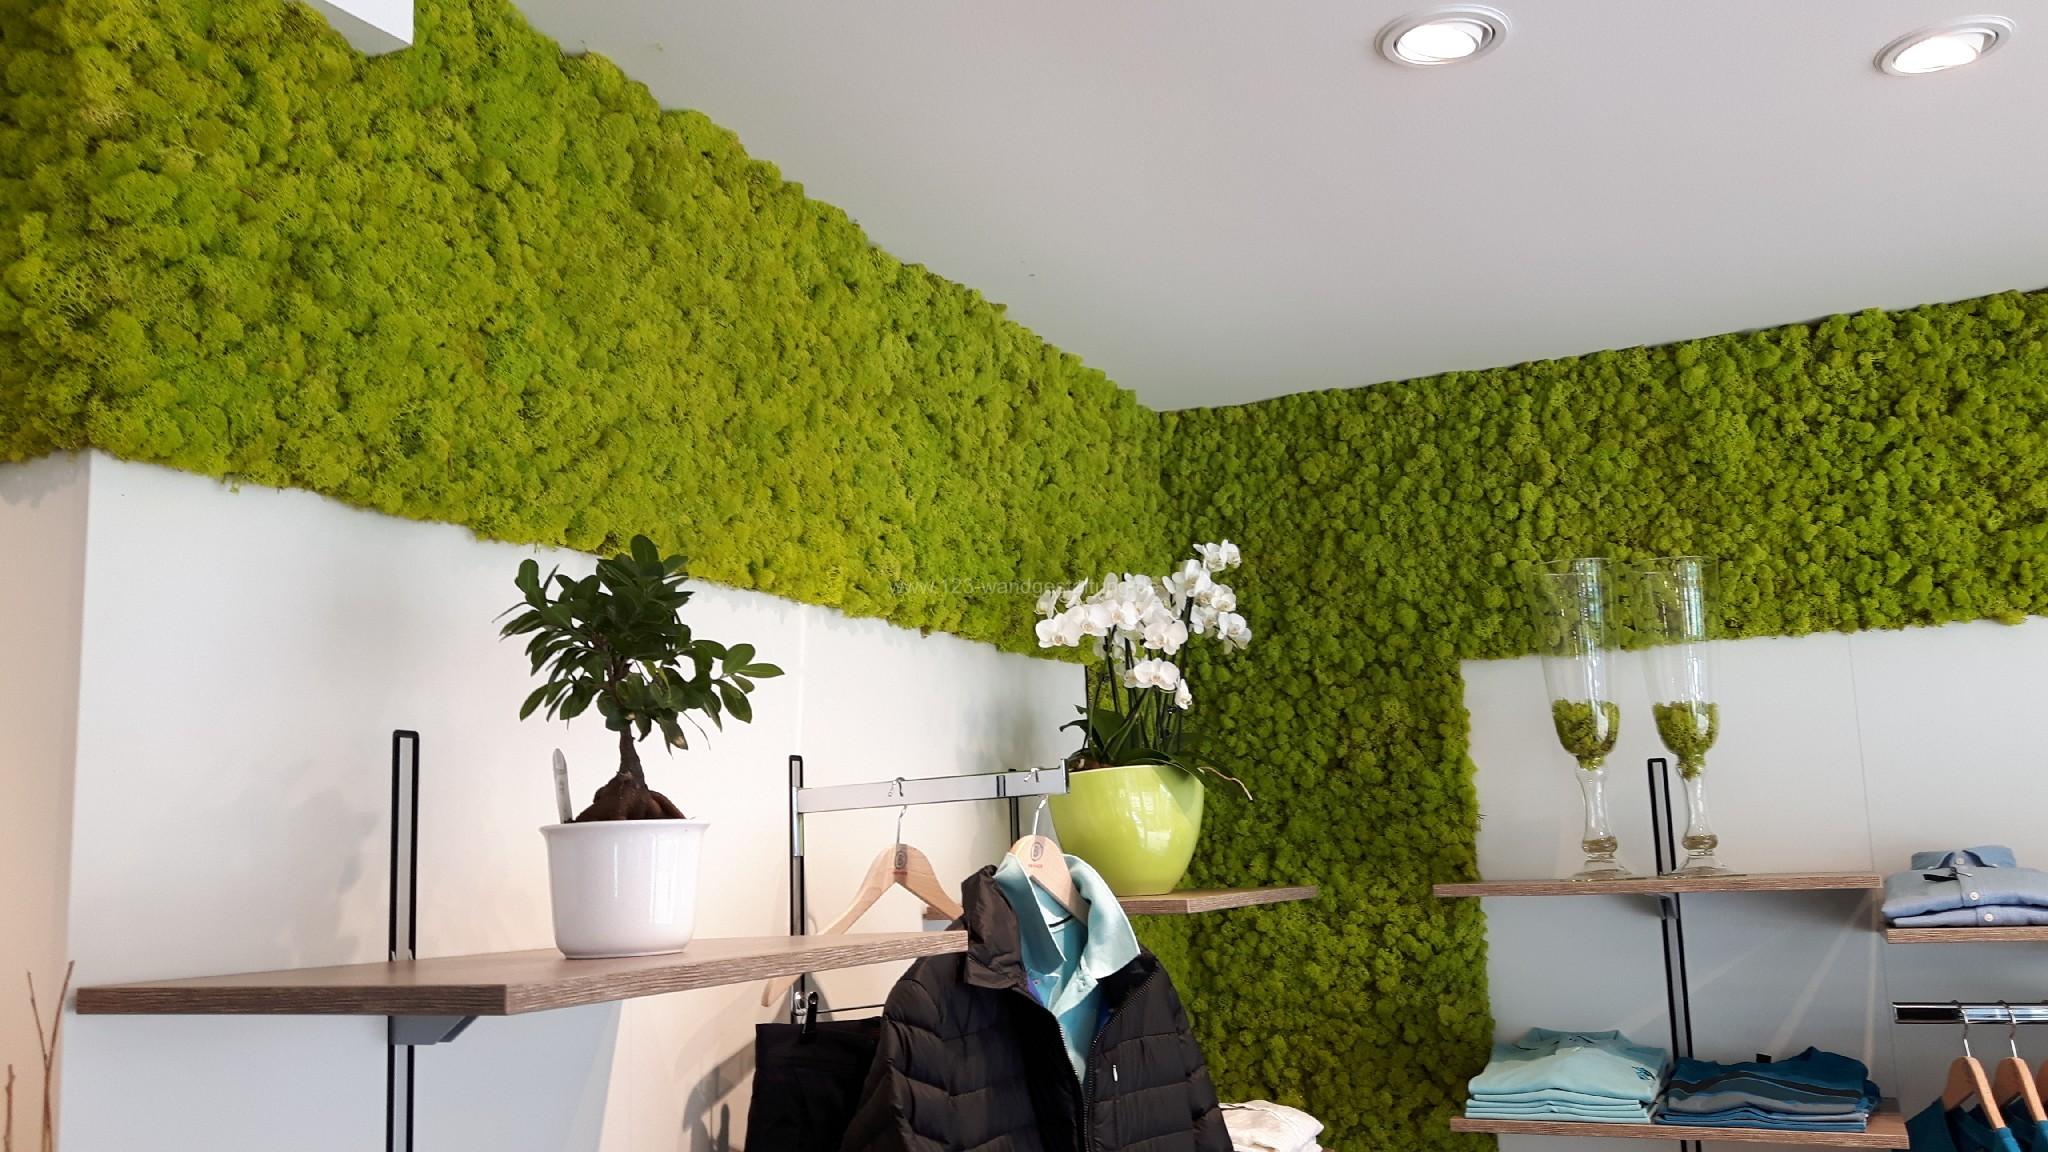 ladenbau moosw nde mit islandmoos als wandgestaltung. Black Bedroom Furniture Sets. Home Design Ideas